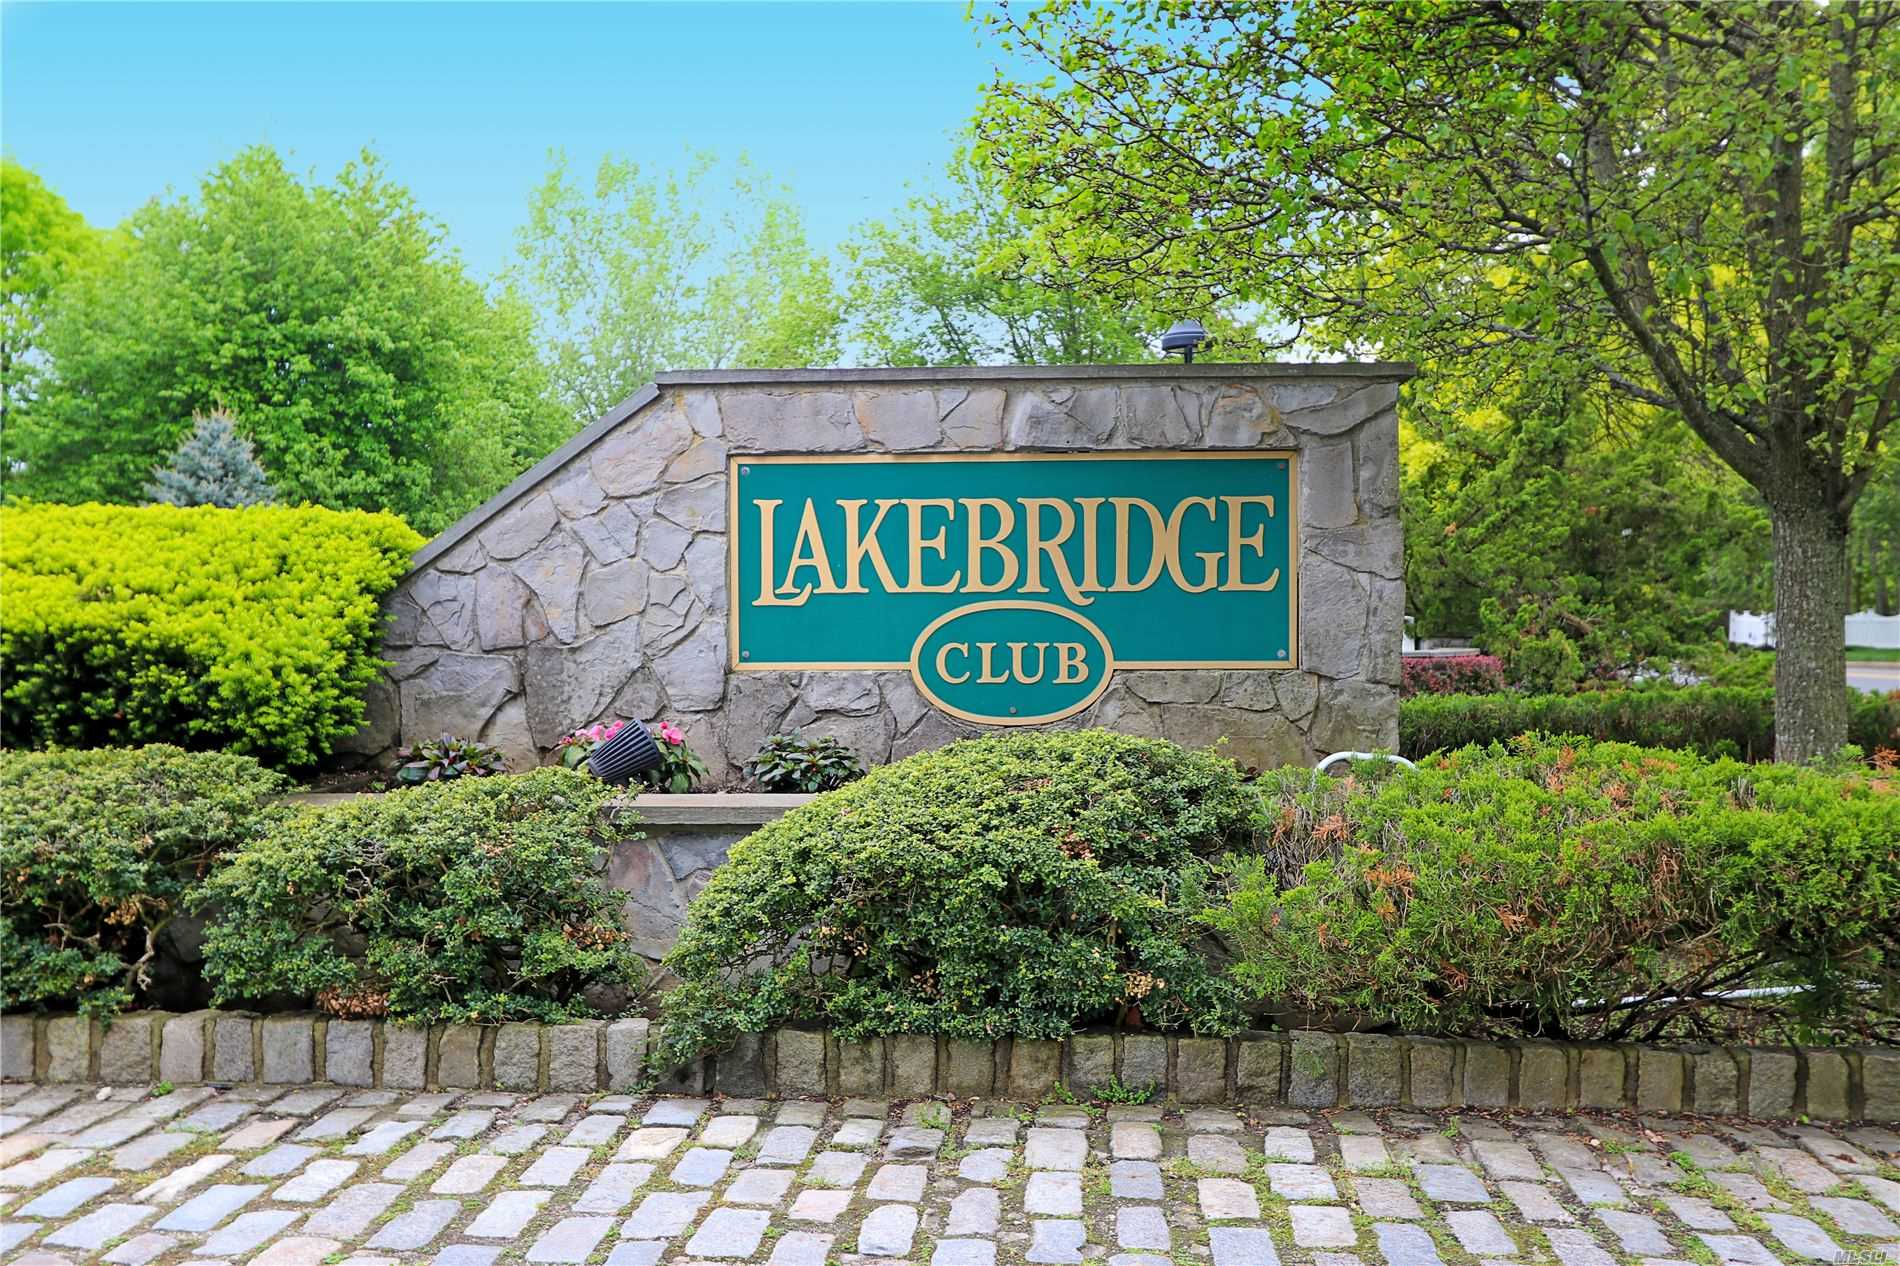 Property for sale at 97 Lakebridge Drive, Kings Park NY 11754, Kings Park,  New York 11754